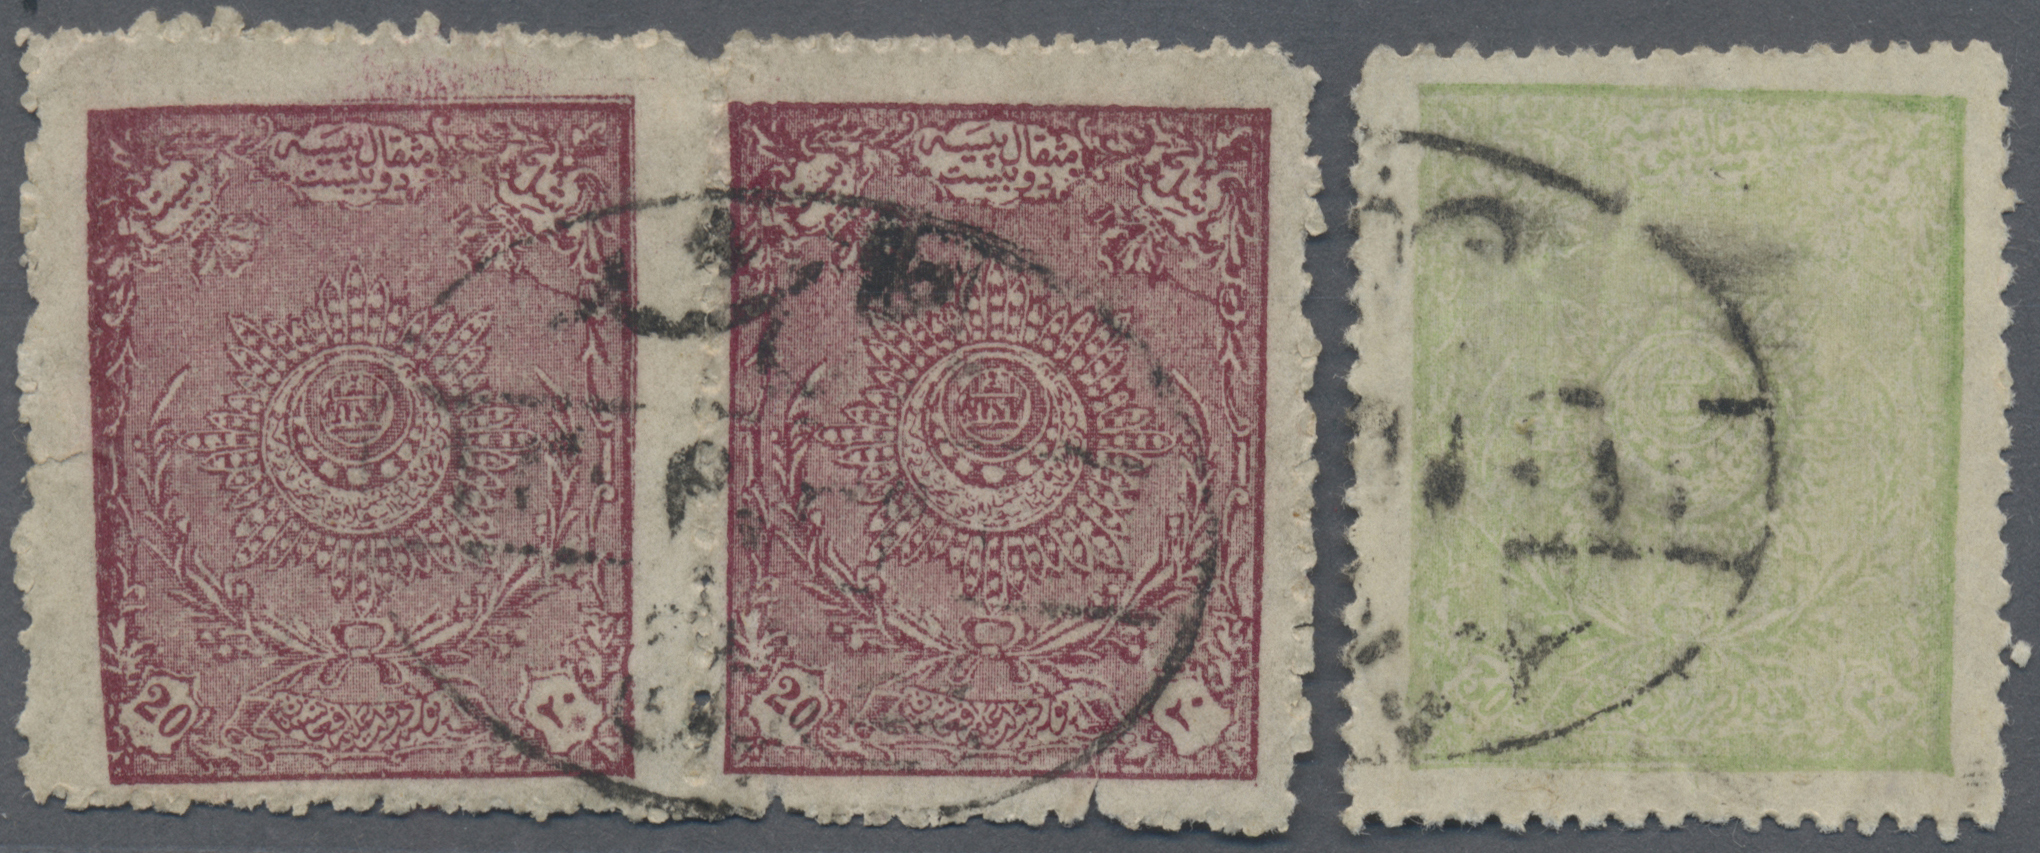 Lot 05003 - Afghanistan  -  Auktionshaus Christoph Gärtner GmbH & Co. KG Sale #48 The Single Lots Philatelie